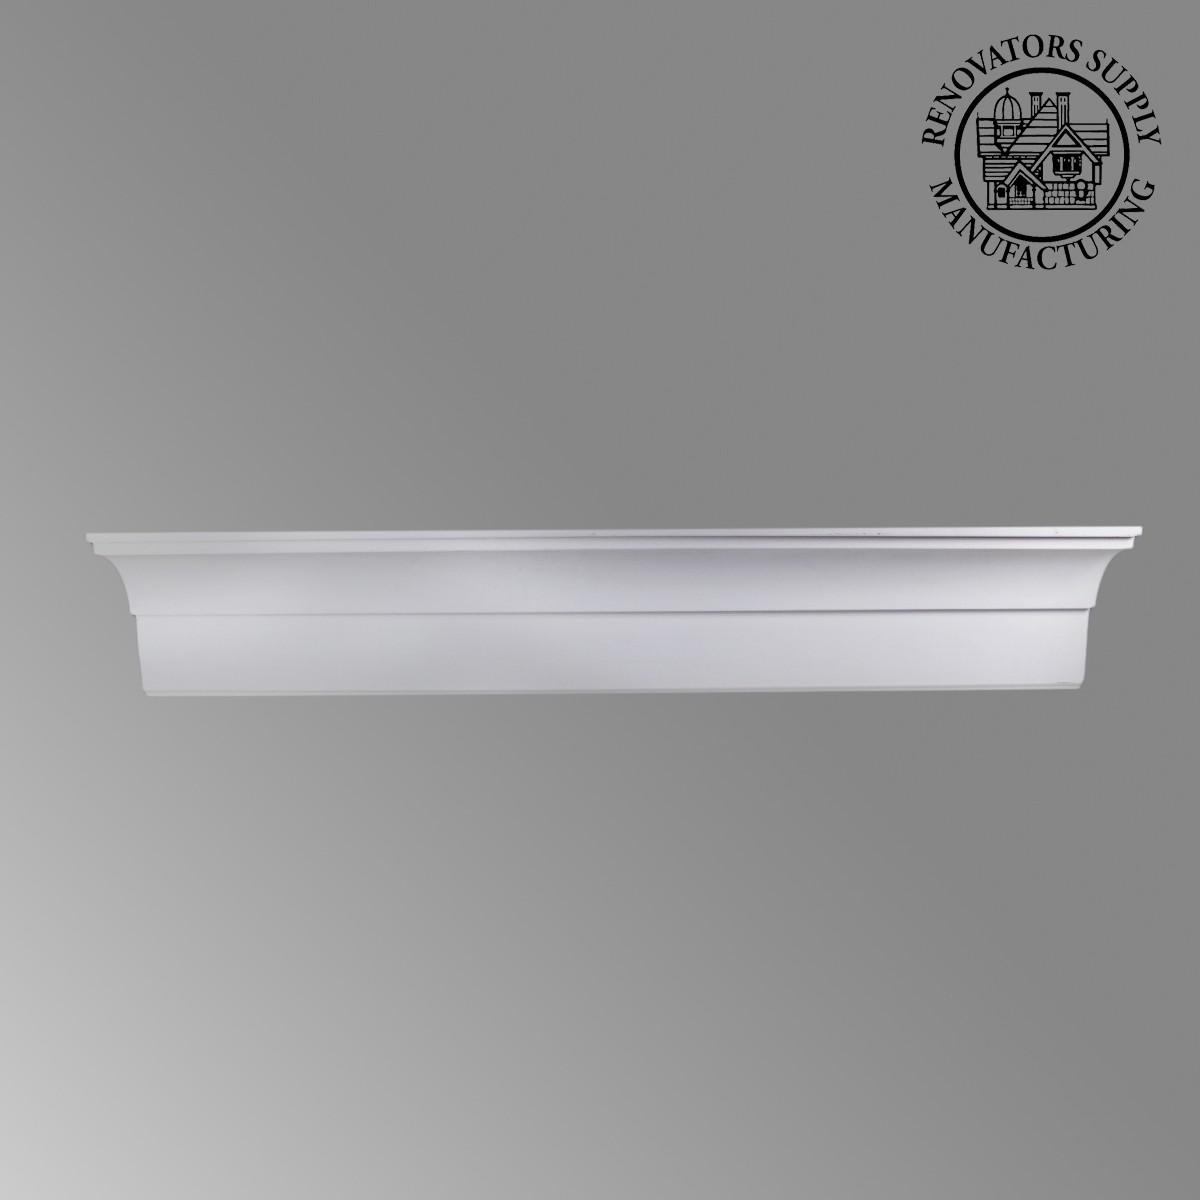 Cornice White Urethane Sample of 11766 23.5 Long Cornice Cornice Moulding Cornice Molding